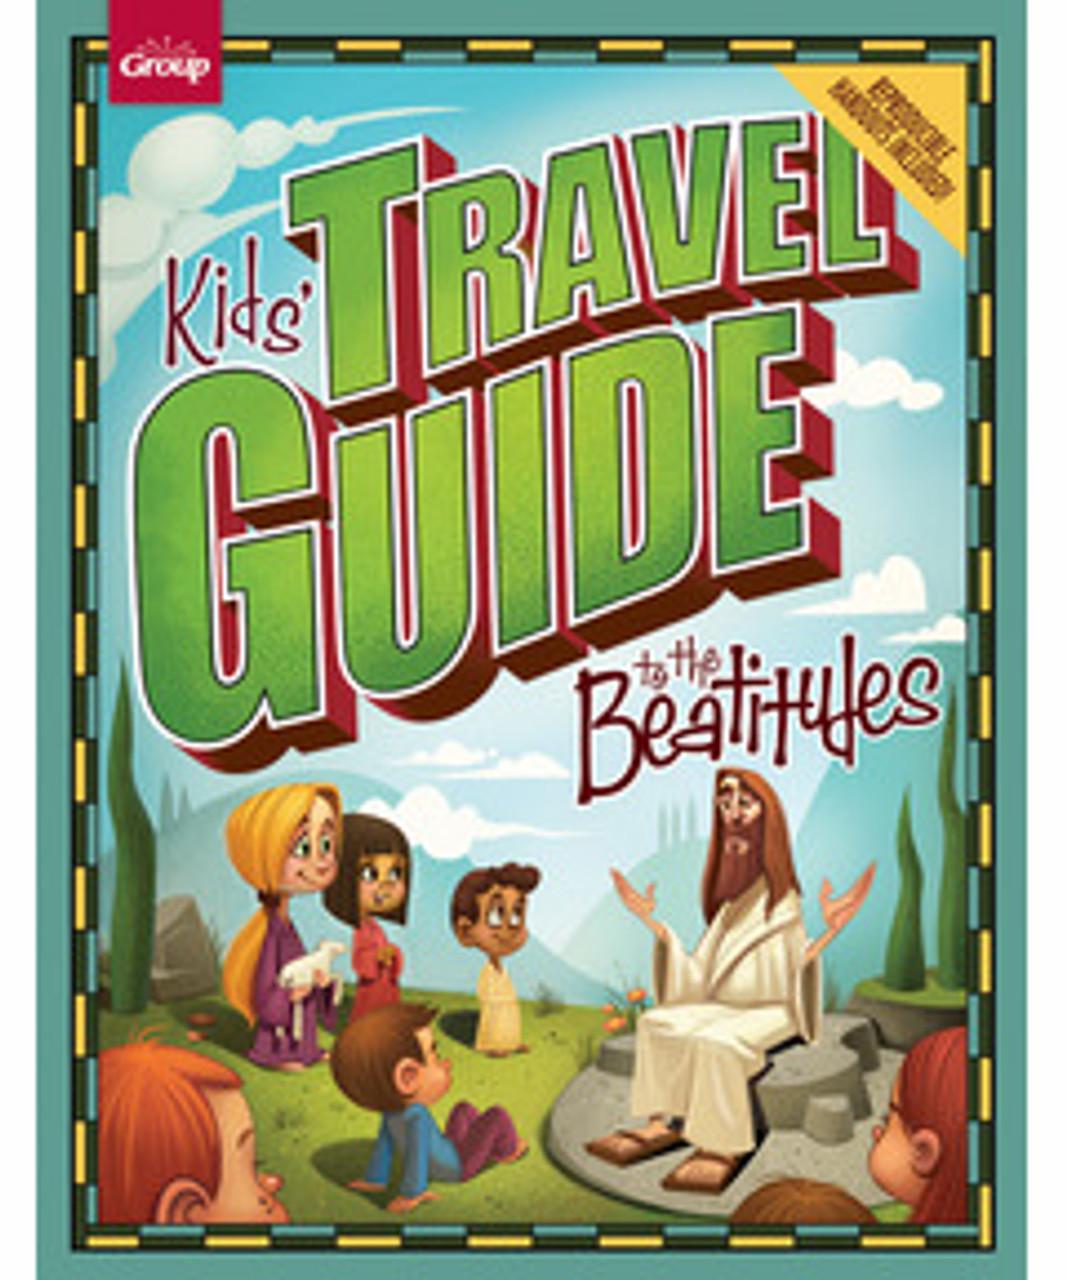 Kids Travel Guide Beatitudes